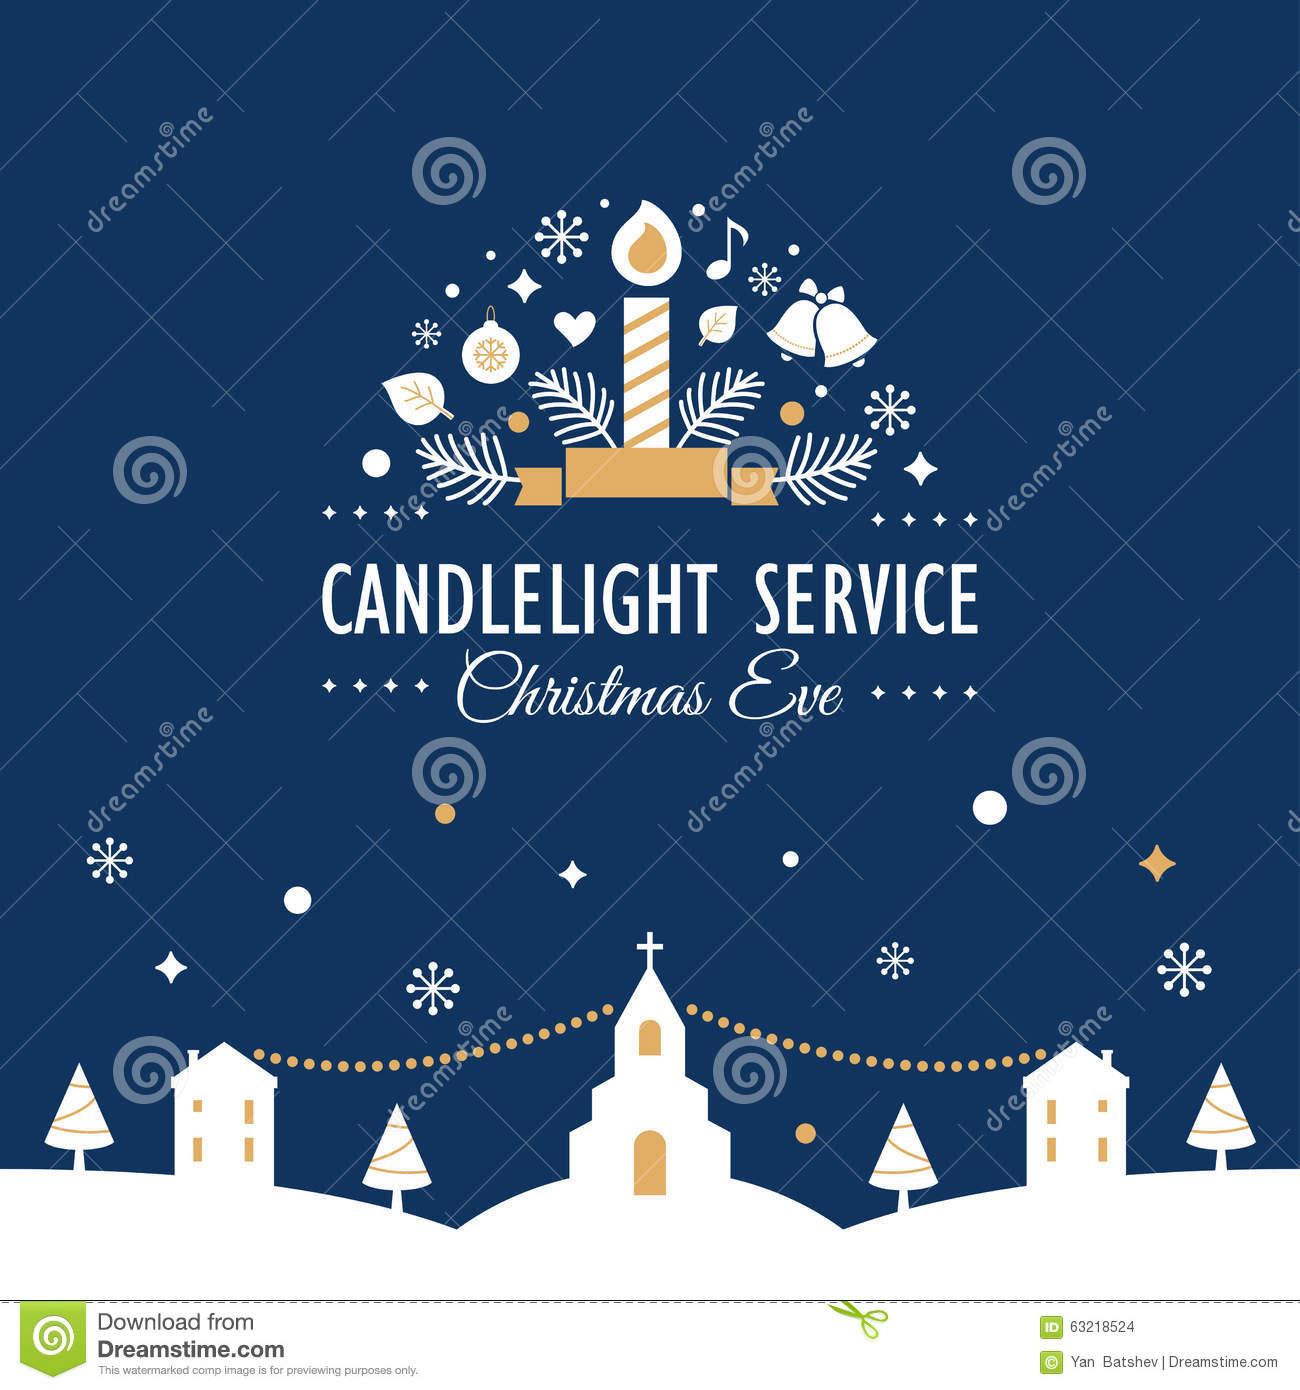 christmas eve service clipart - photo #6